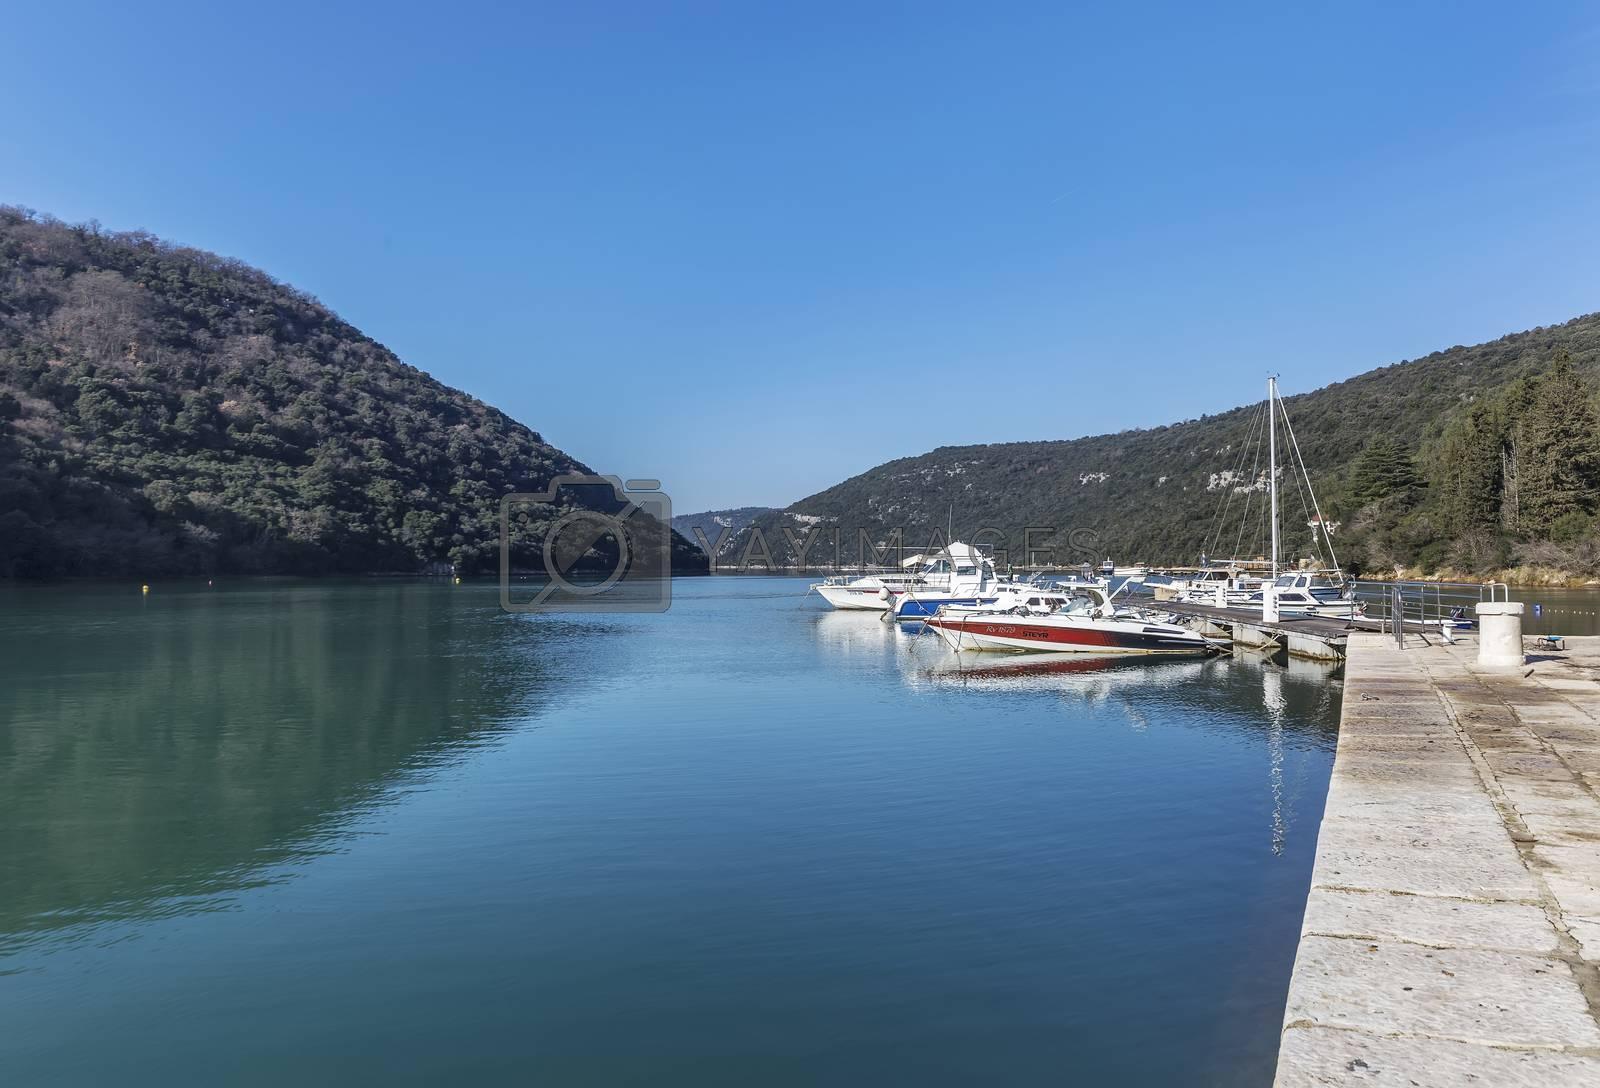 LIMSKI KANAL, CROATIA - January 29, 2020: Anchored boats in a sunny port in the Lim Canal, Istria, Croatia